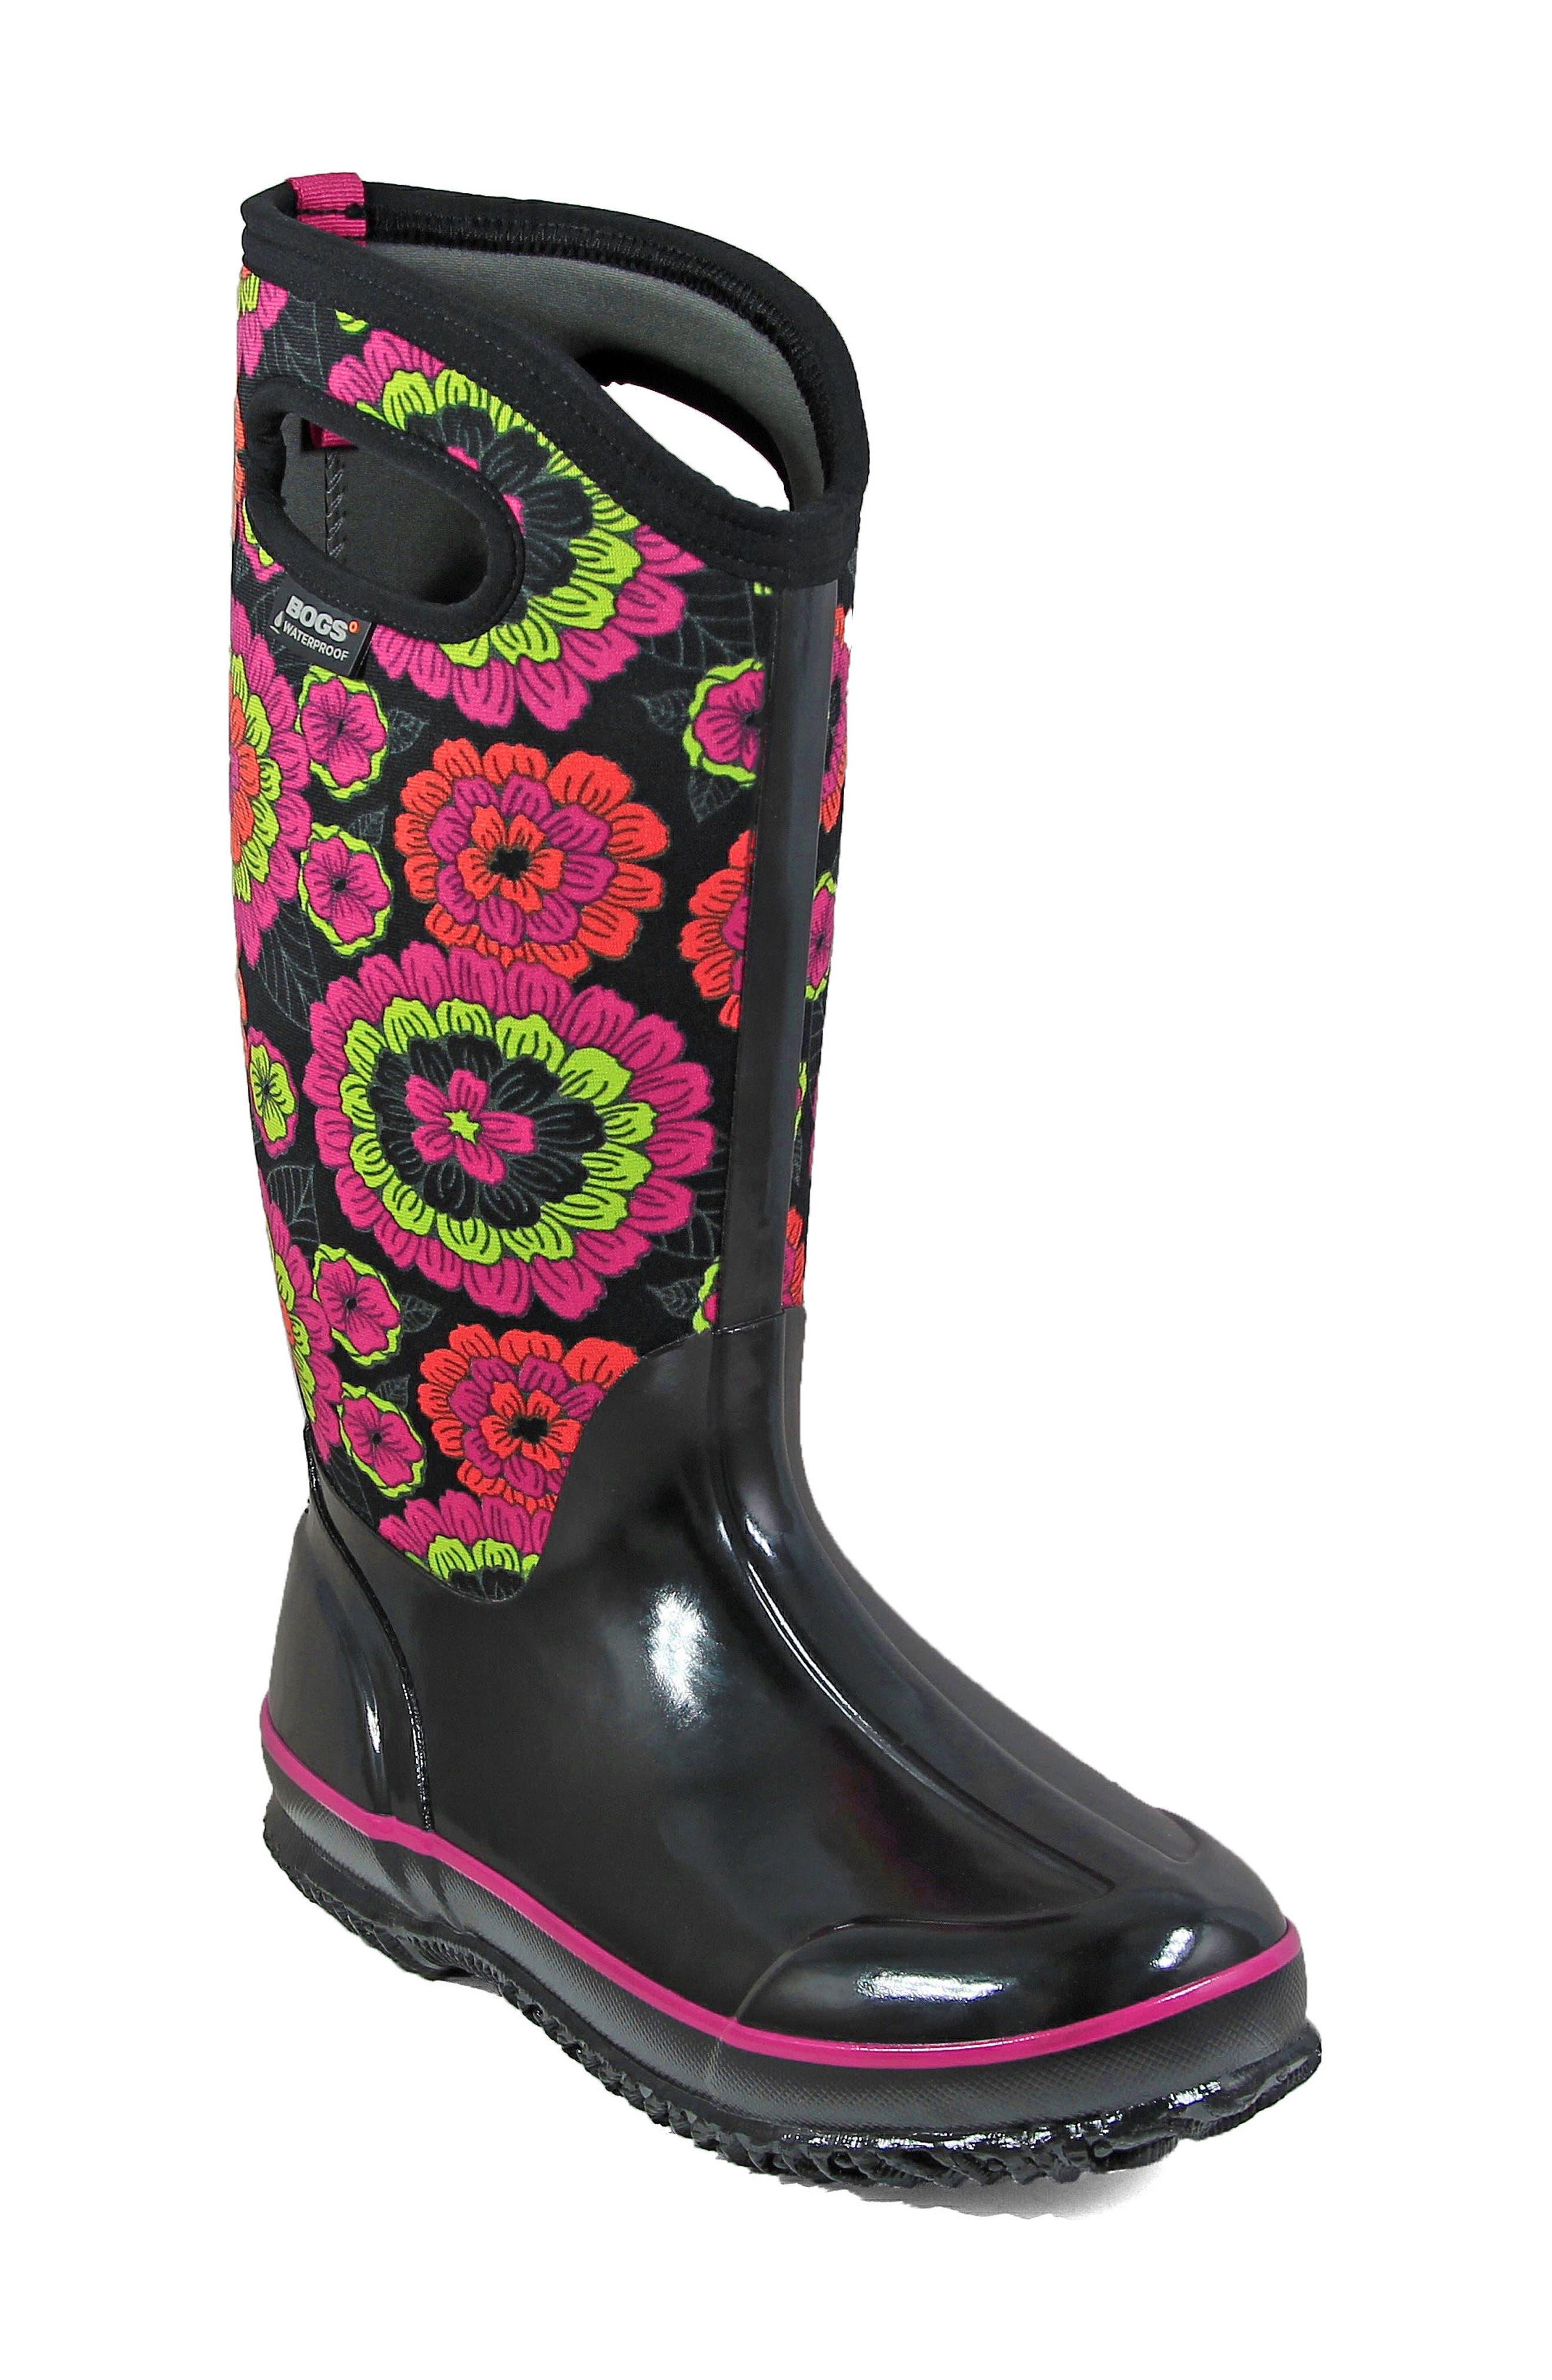 Bogs Women's Classic Pansies Waterproof Insulated Boot zk9wG